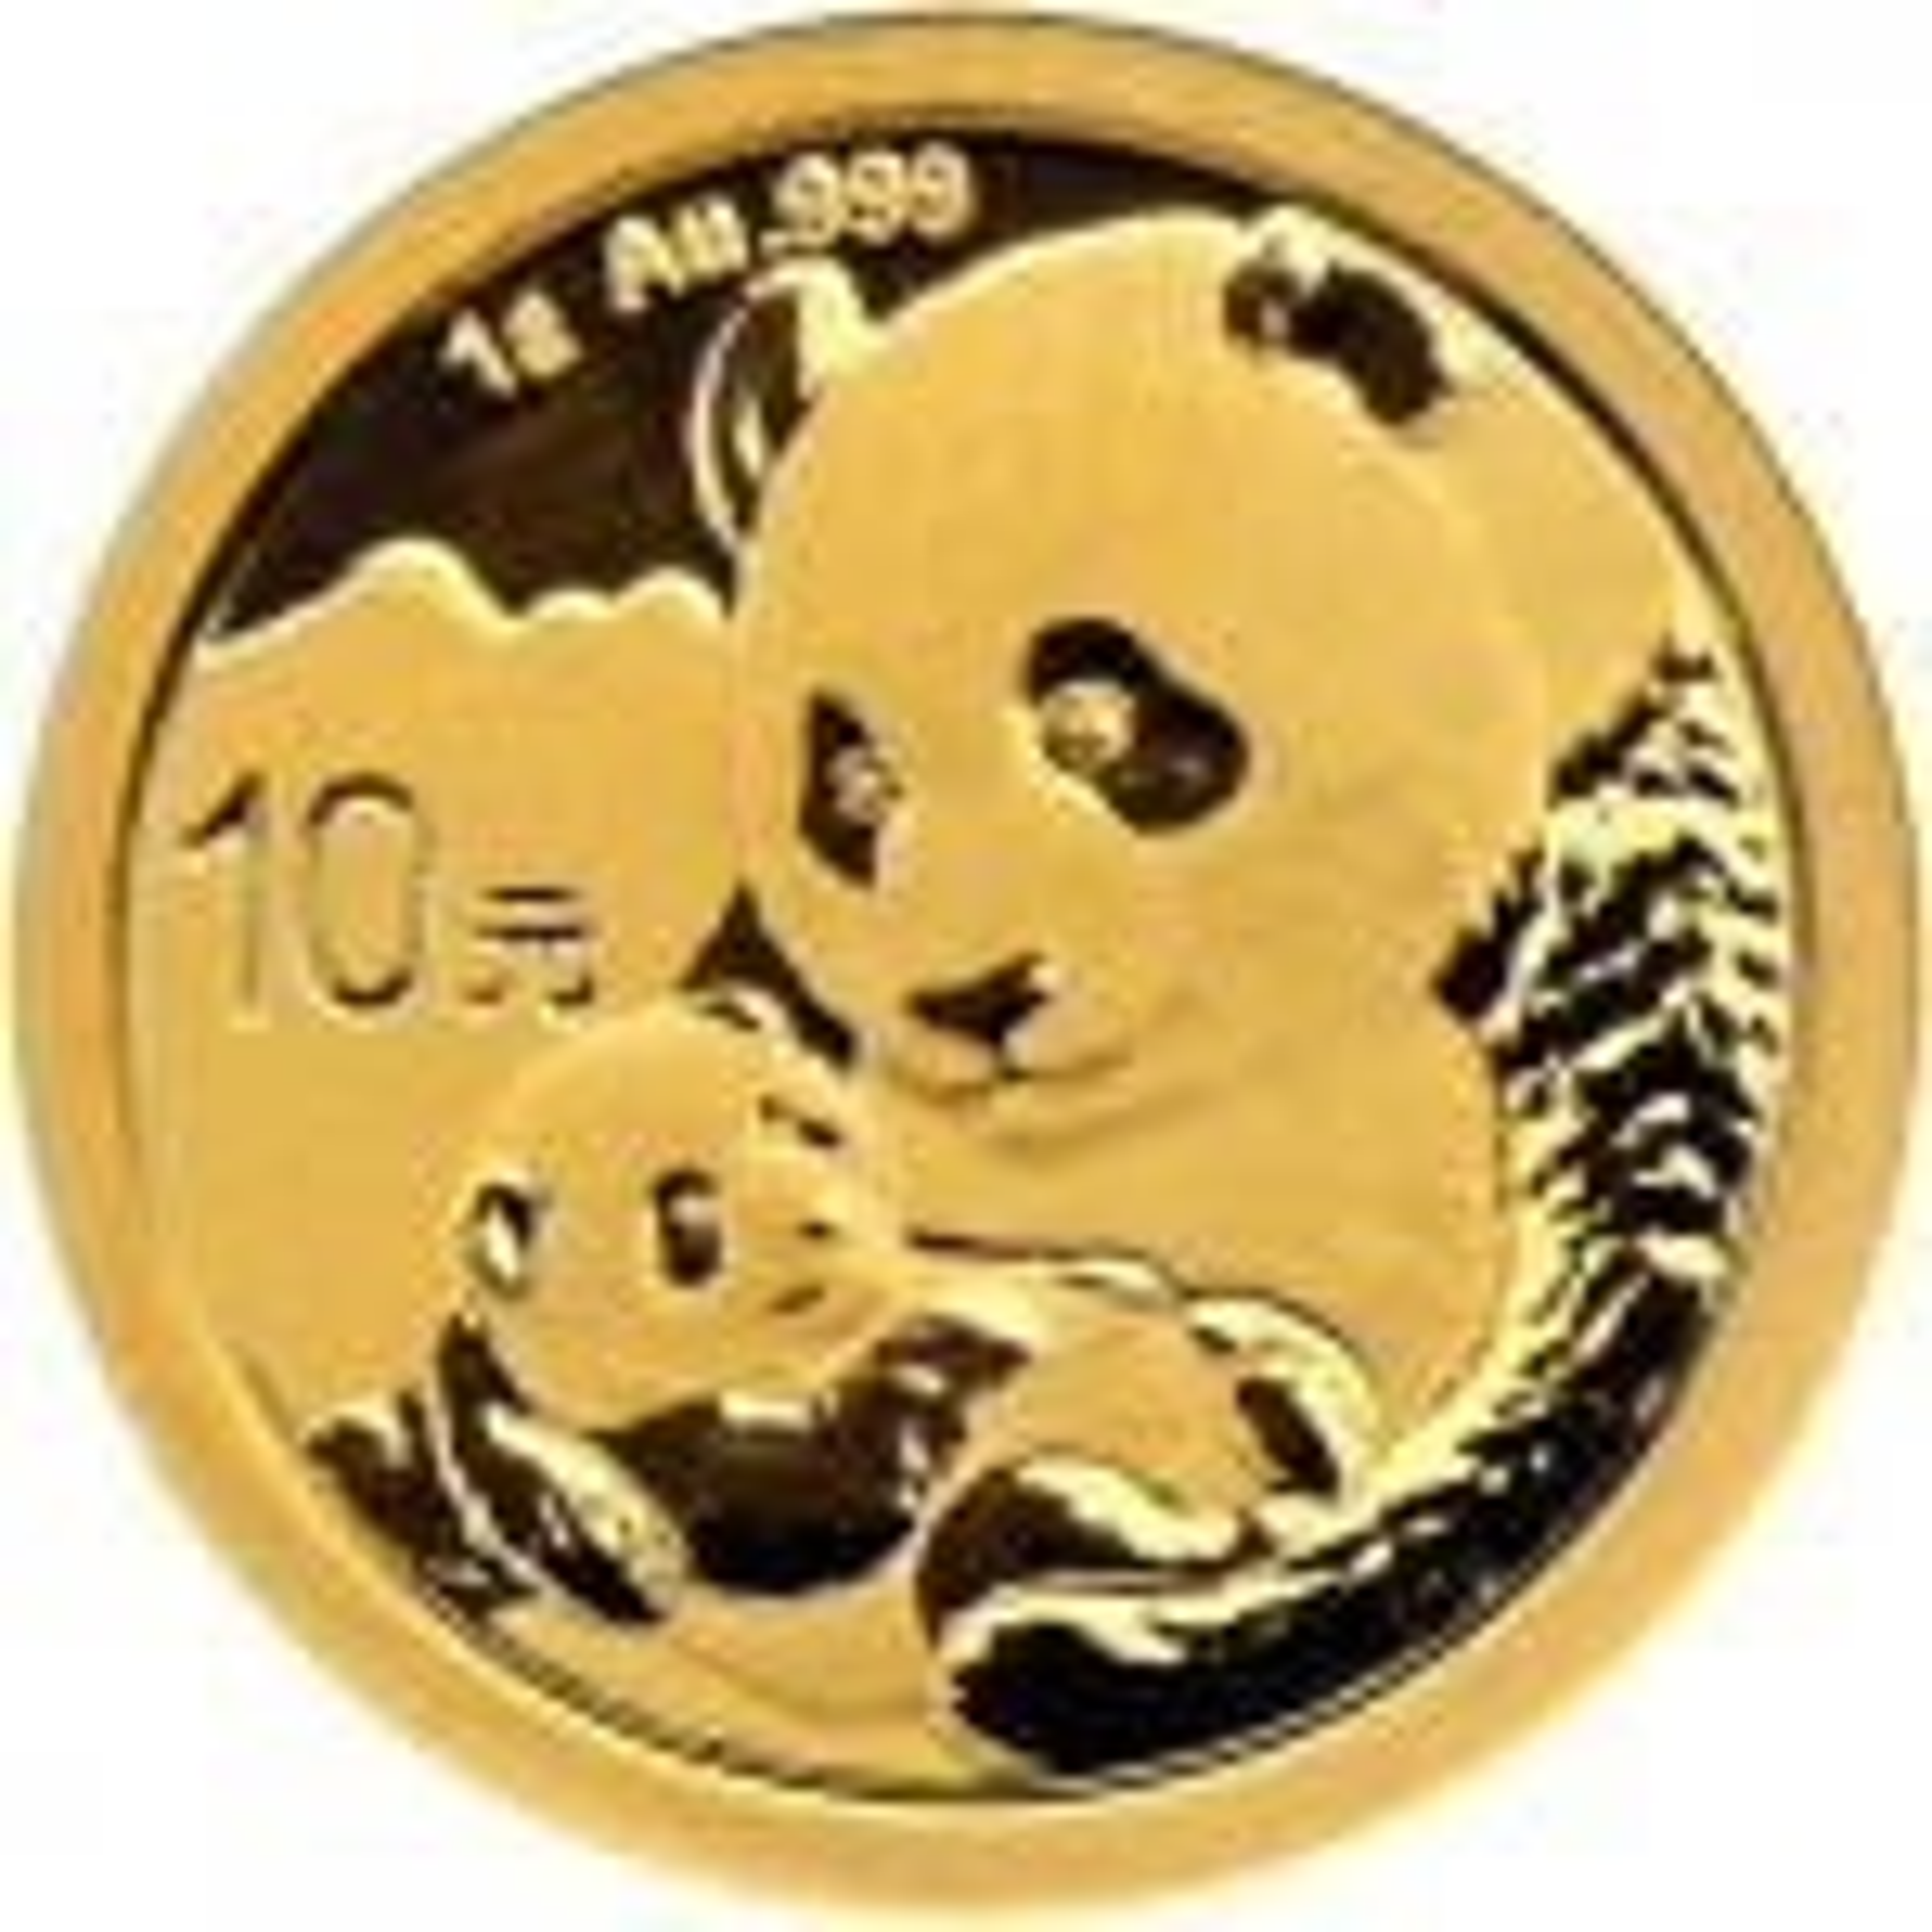 1 Gram gold coin Panda 2019